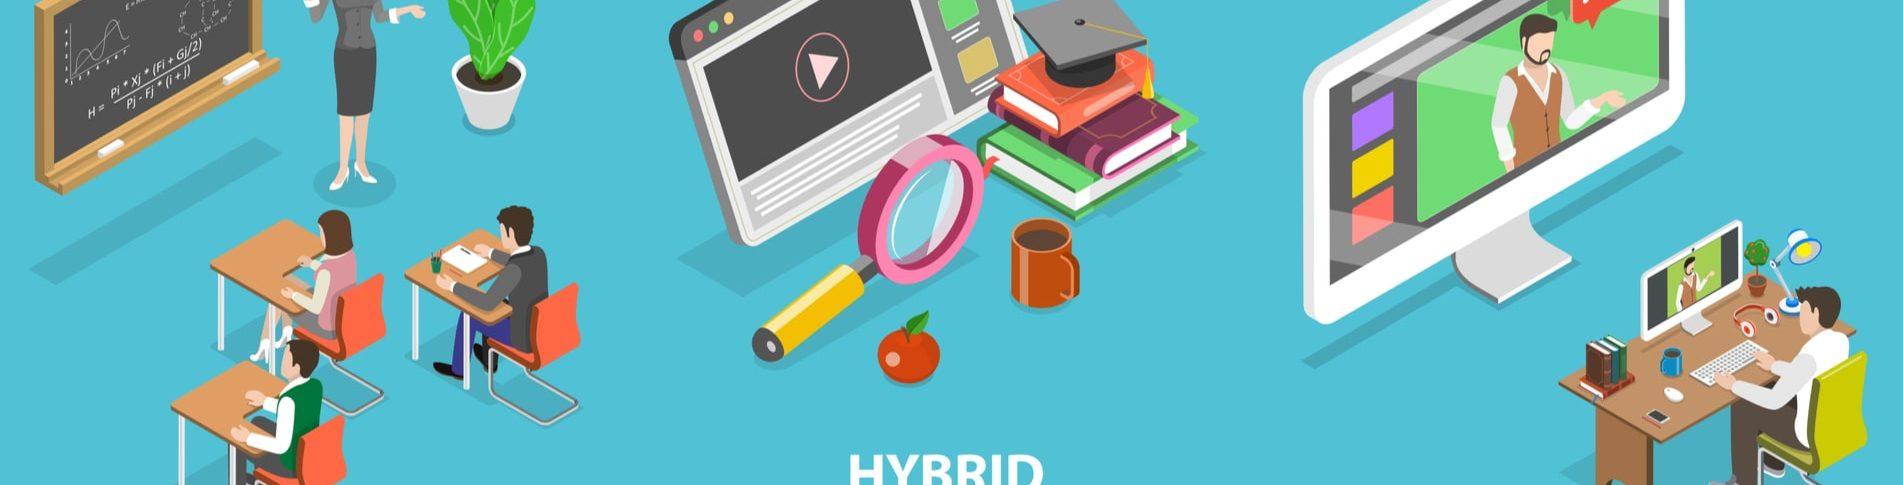 Hybrid Working, remote working concept